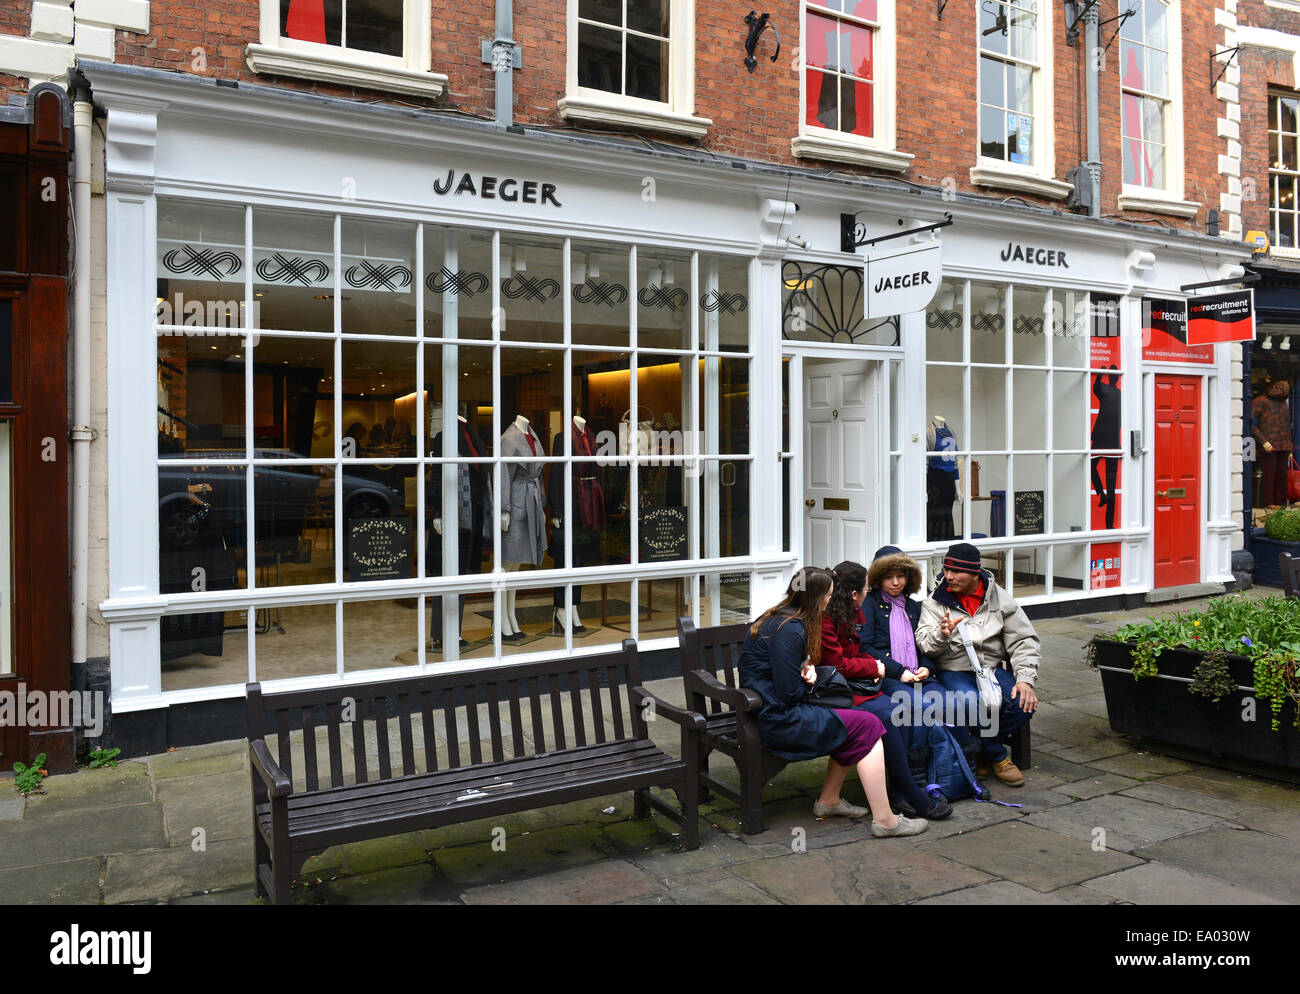 Jaeger shop shops store stores Shrewsbury Uk - Stock Image